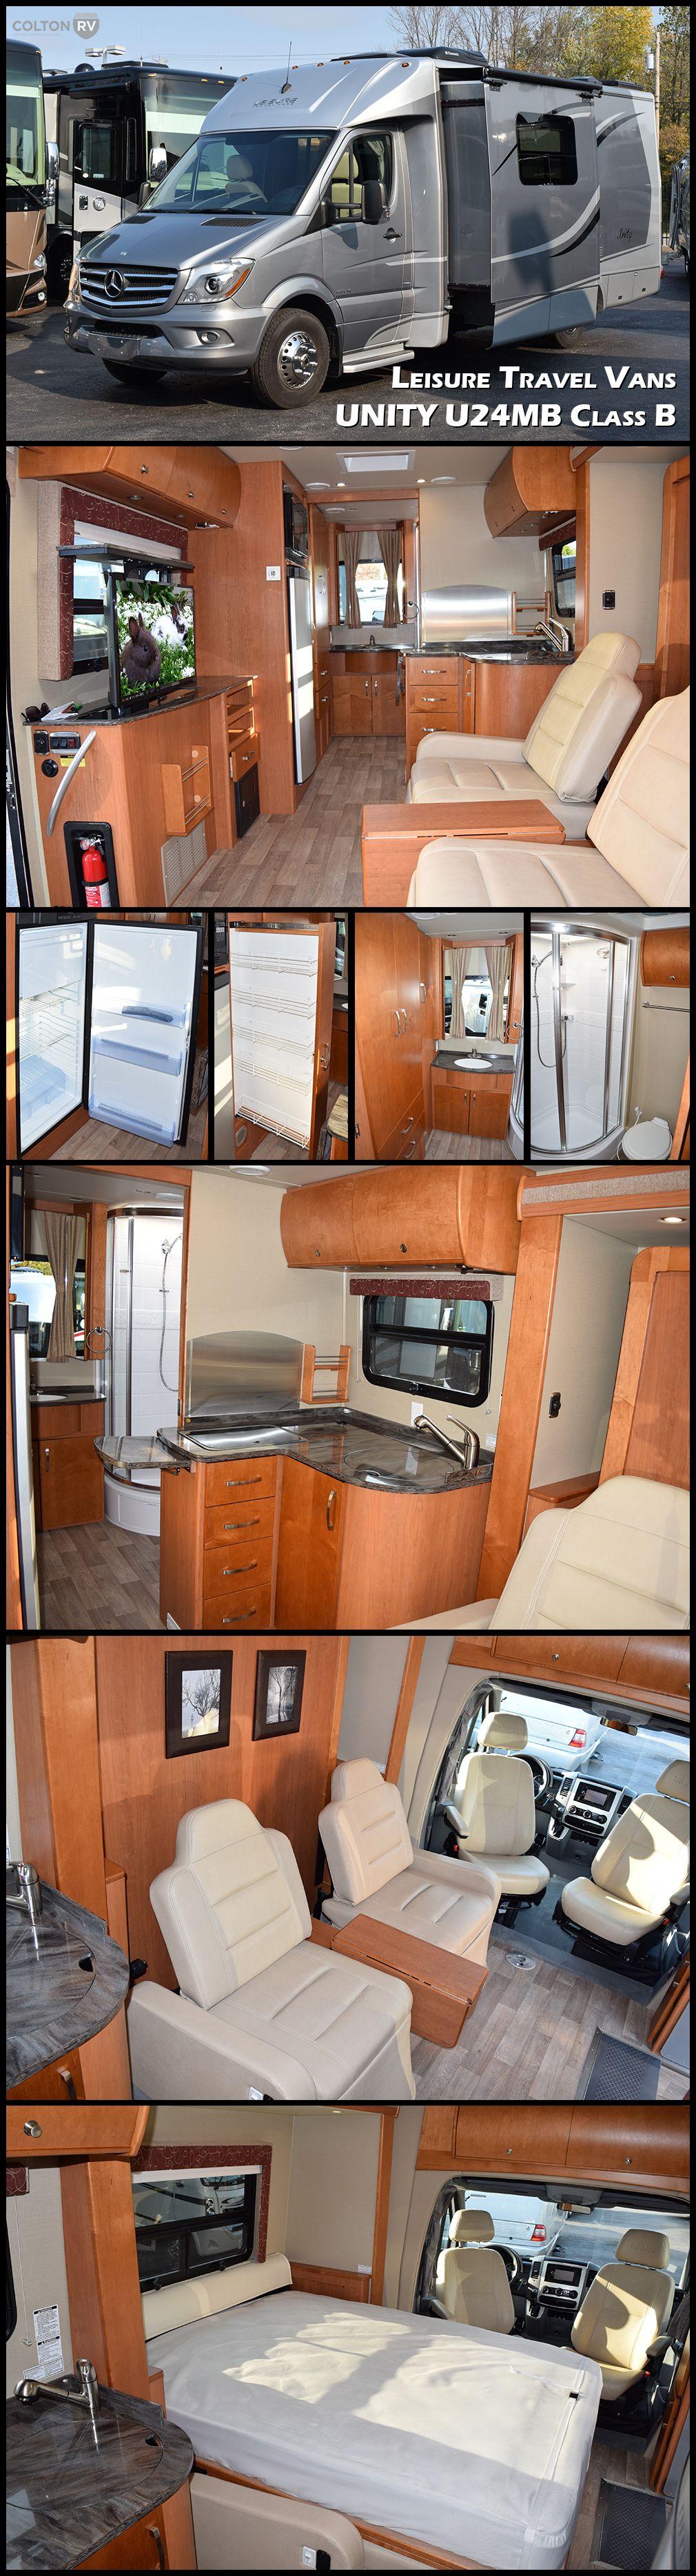 UNITY U24M by LEISURE TRAVEL VANS Class B Motorhome. The